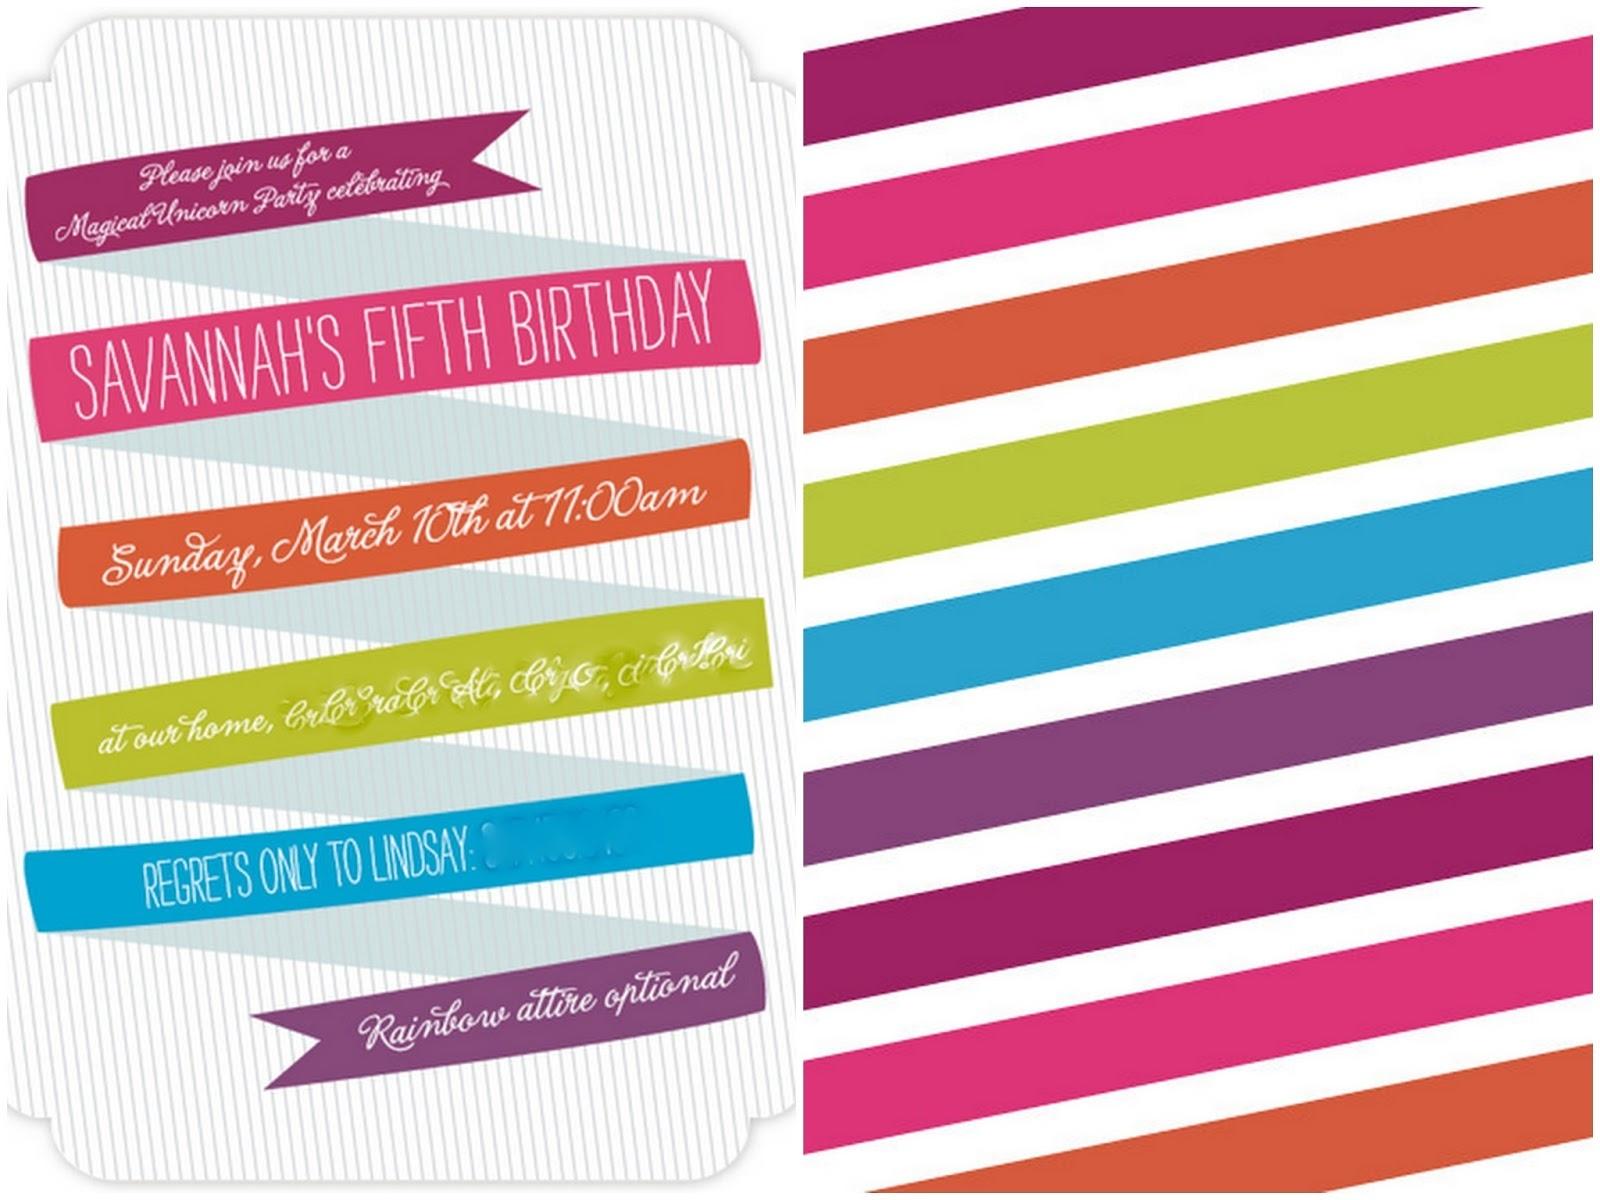 Rainbow Unicorn Birthday Party With Free Printables - The Cottage Mama - Free Printable Rainbow Unicorn Invitations